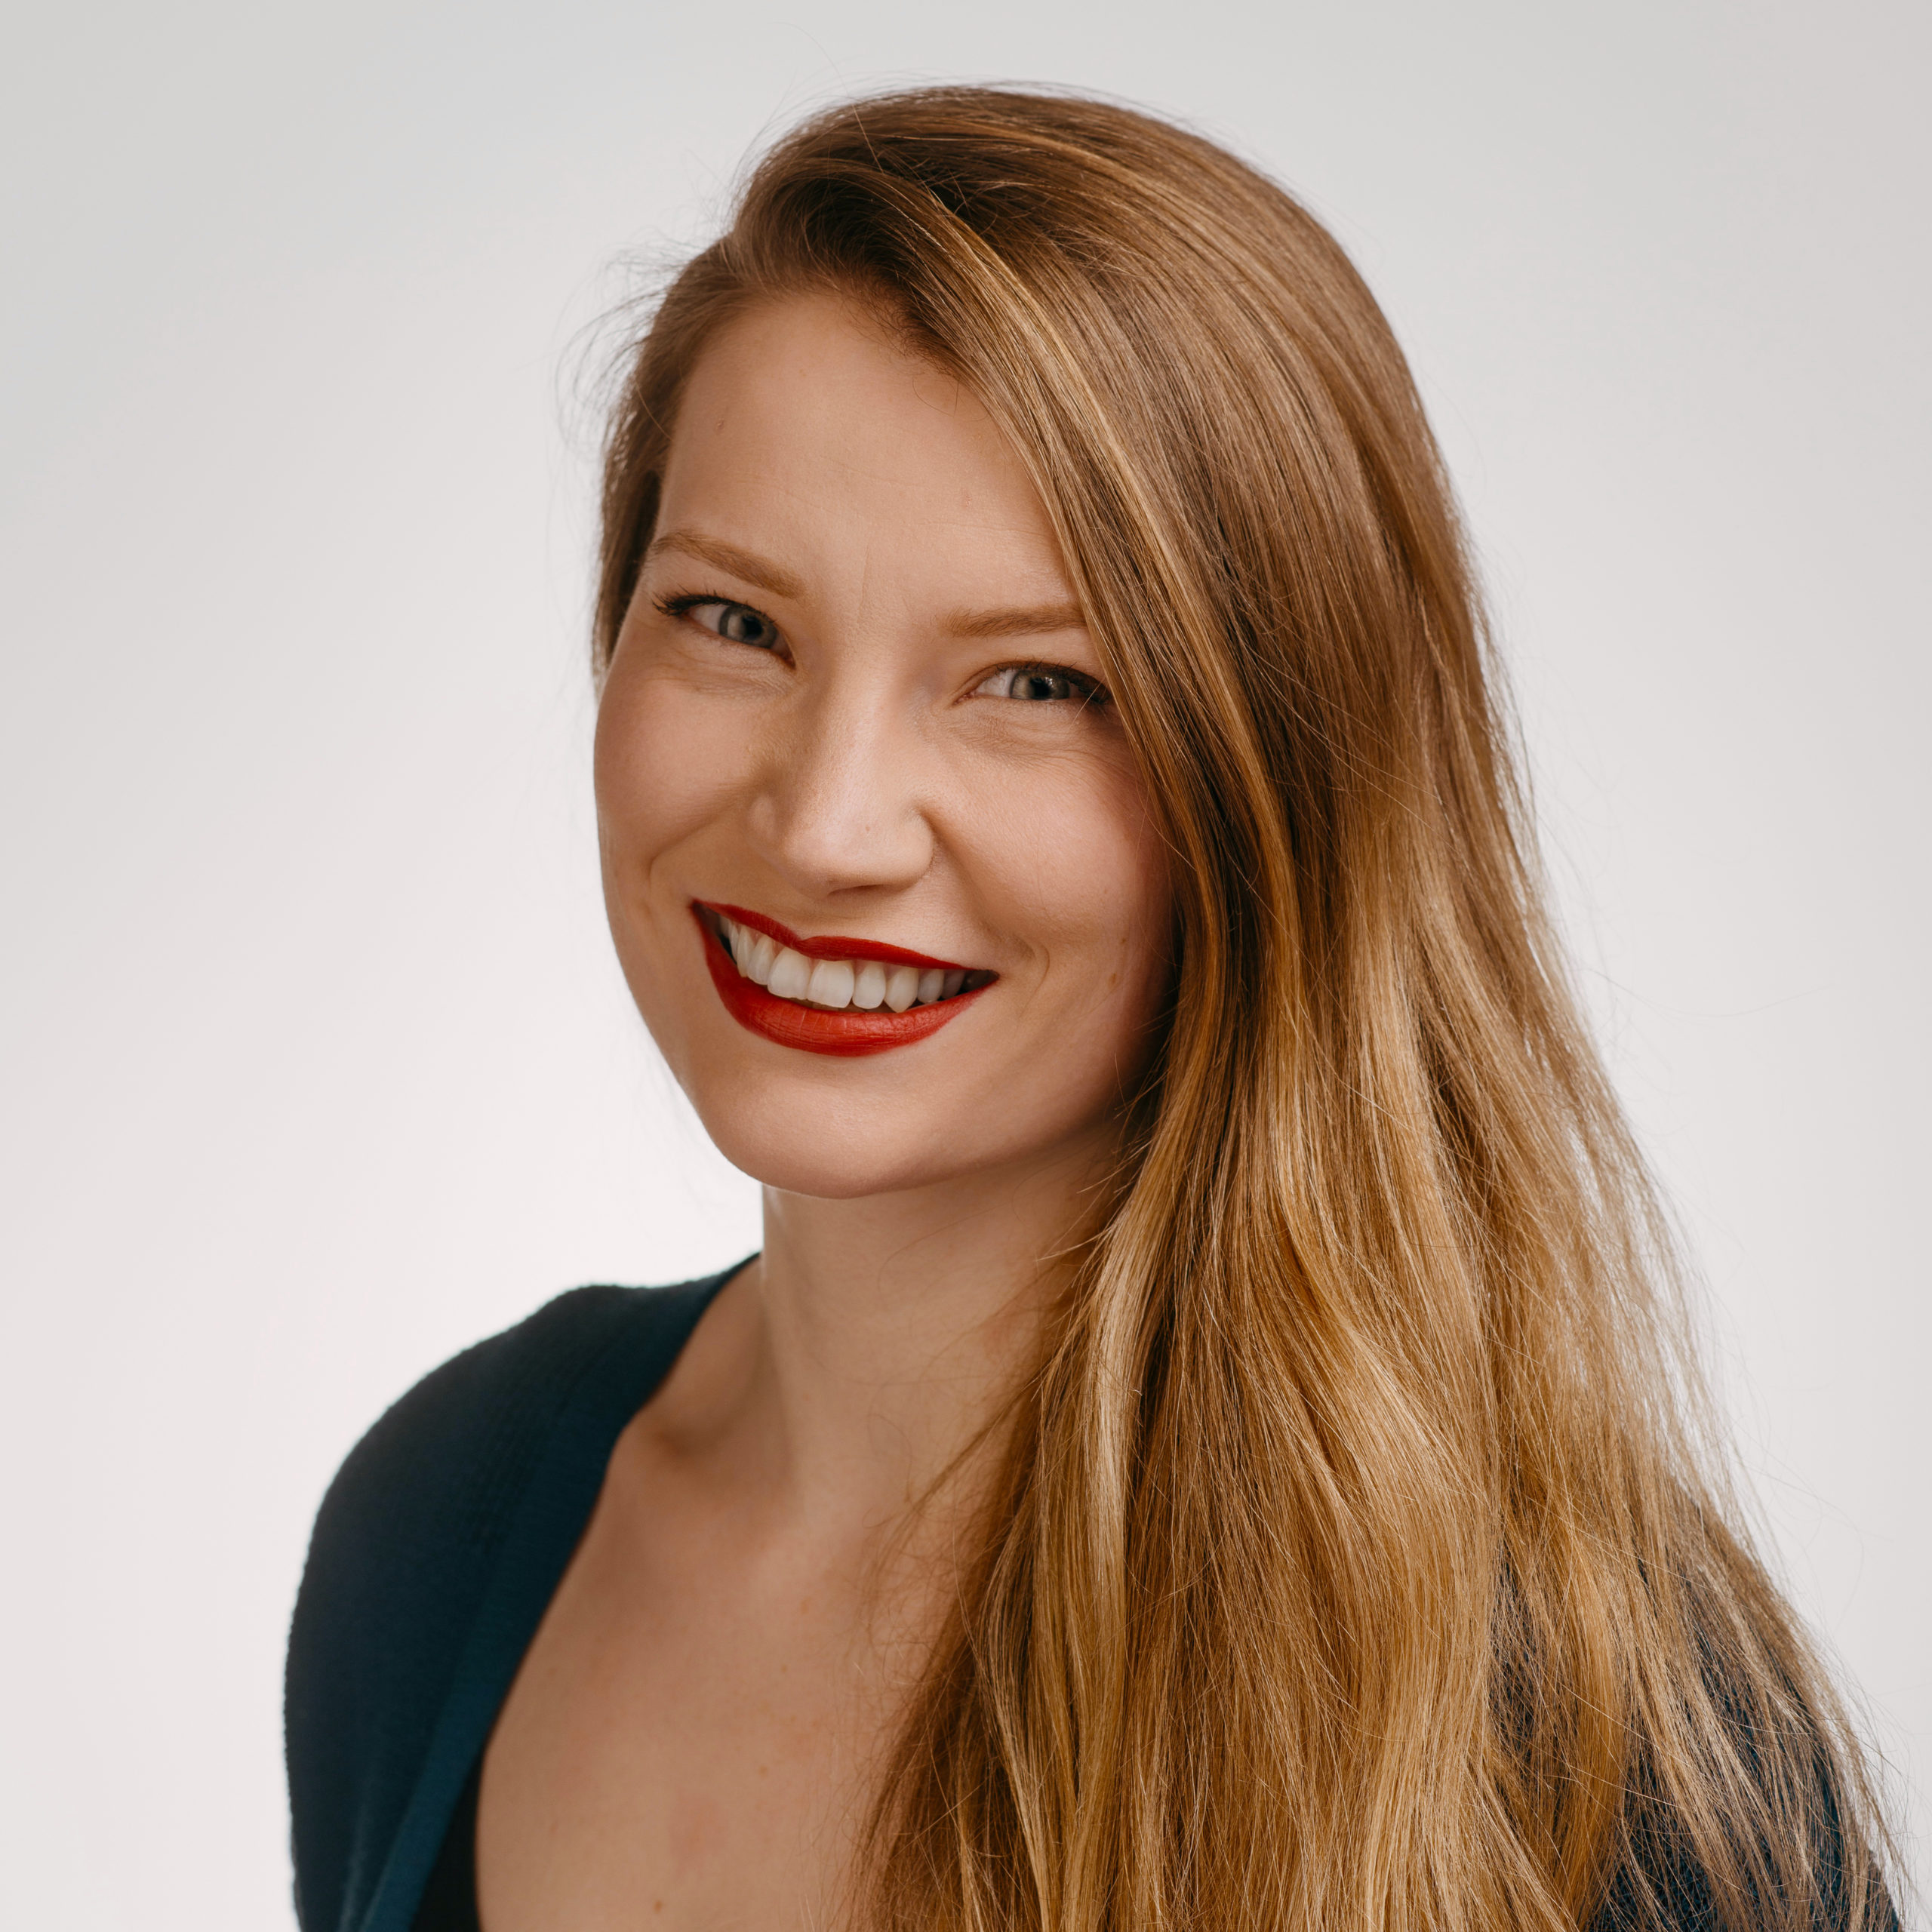 Anni Ojanperä